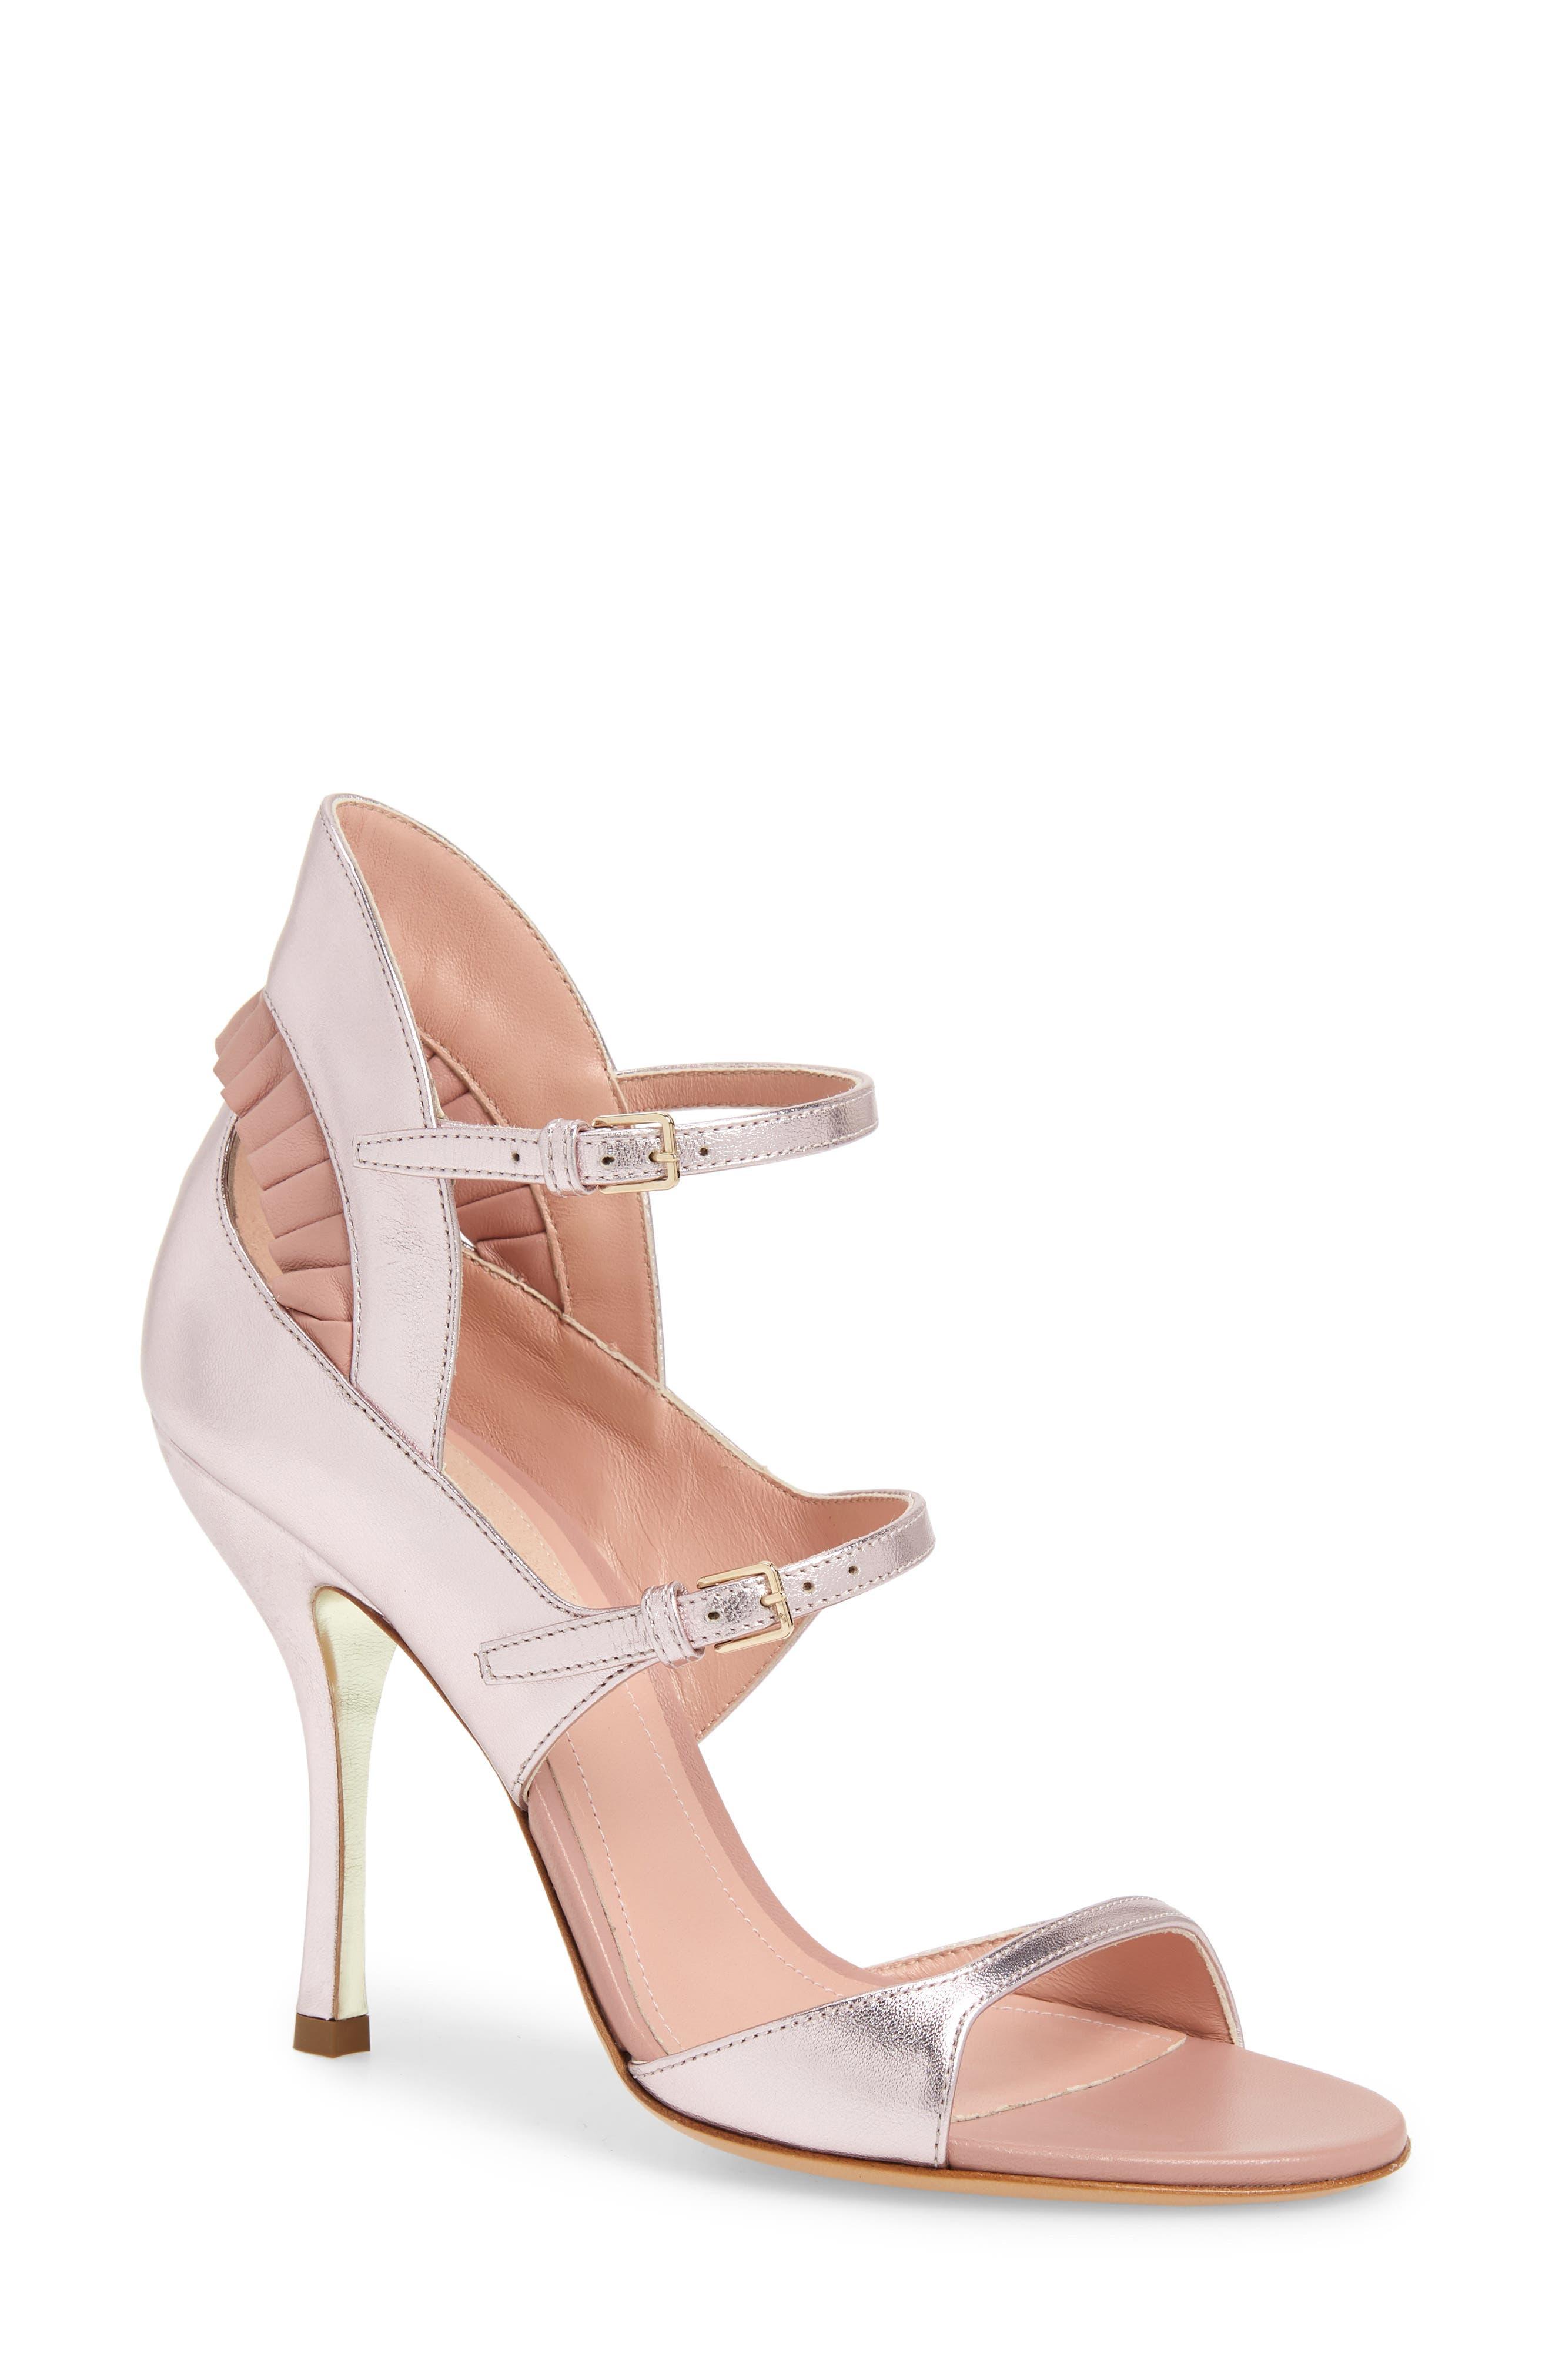 Dahlia Selva Guilty Pleats Sandal, Pink